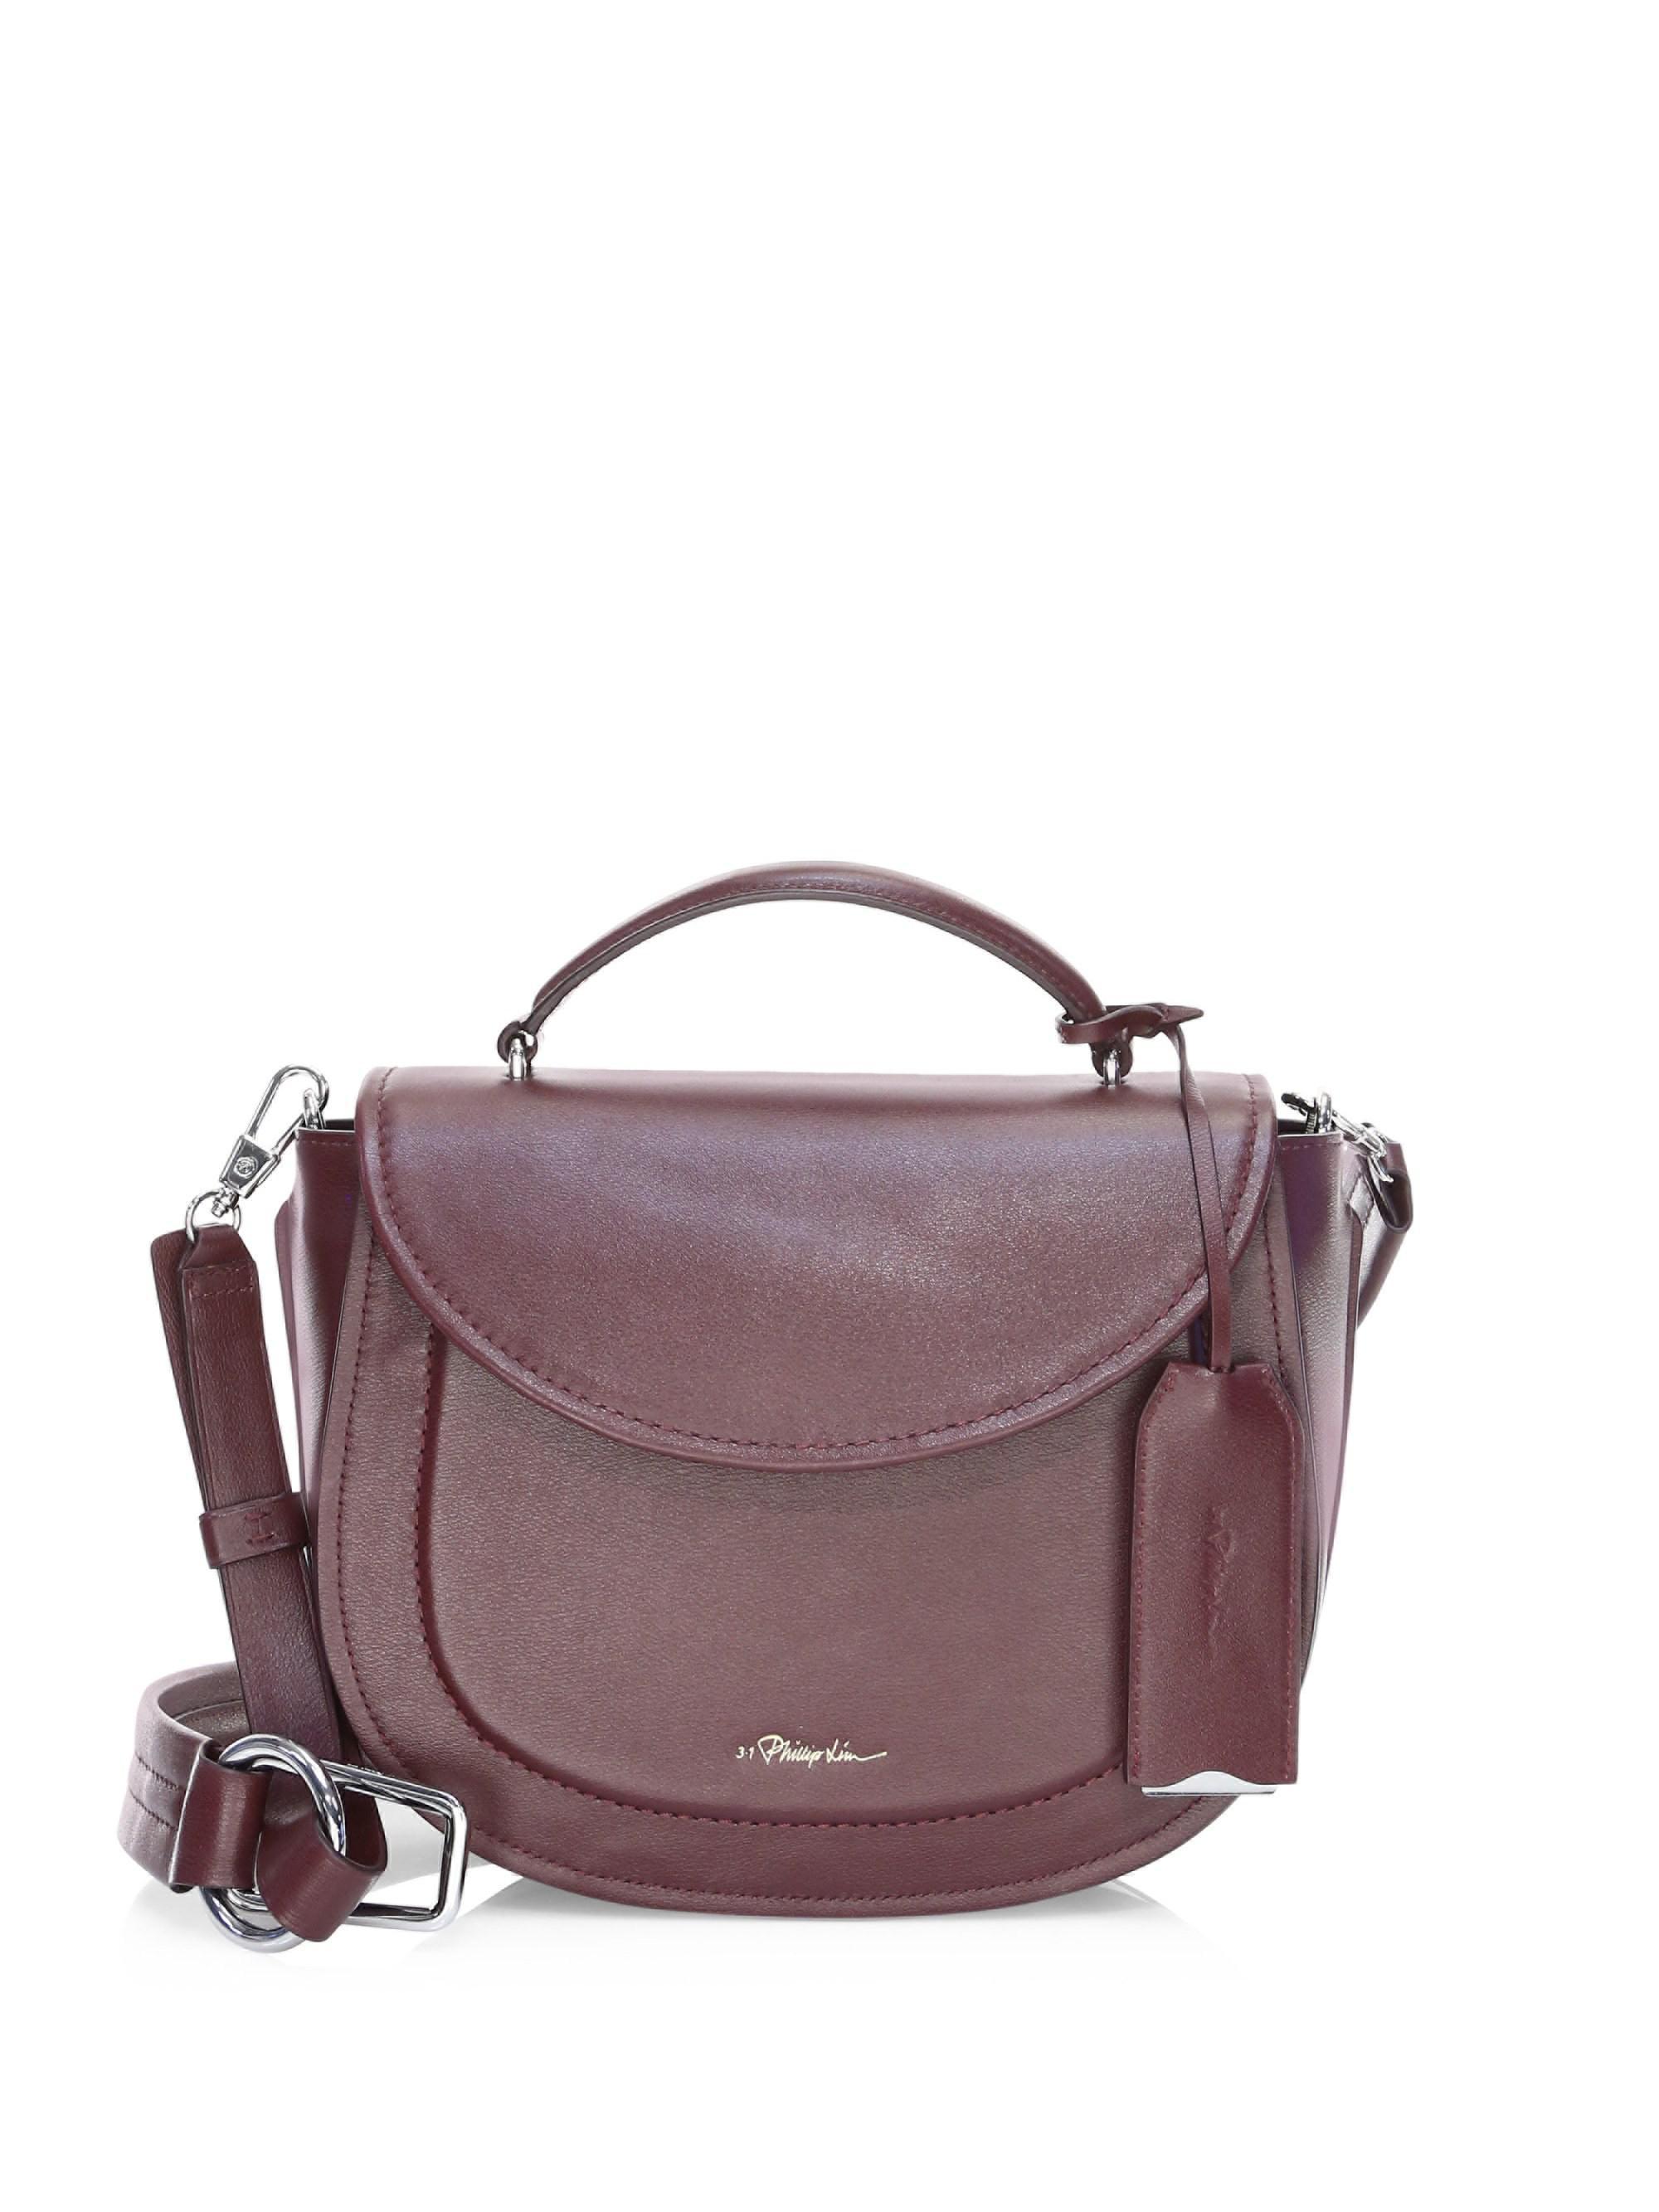 d9cb1e7942b1 3.1 Phillip Lim Hudson Leather Top Handle Saddle Bag - Lyst